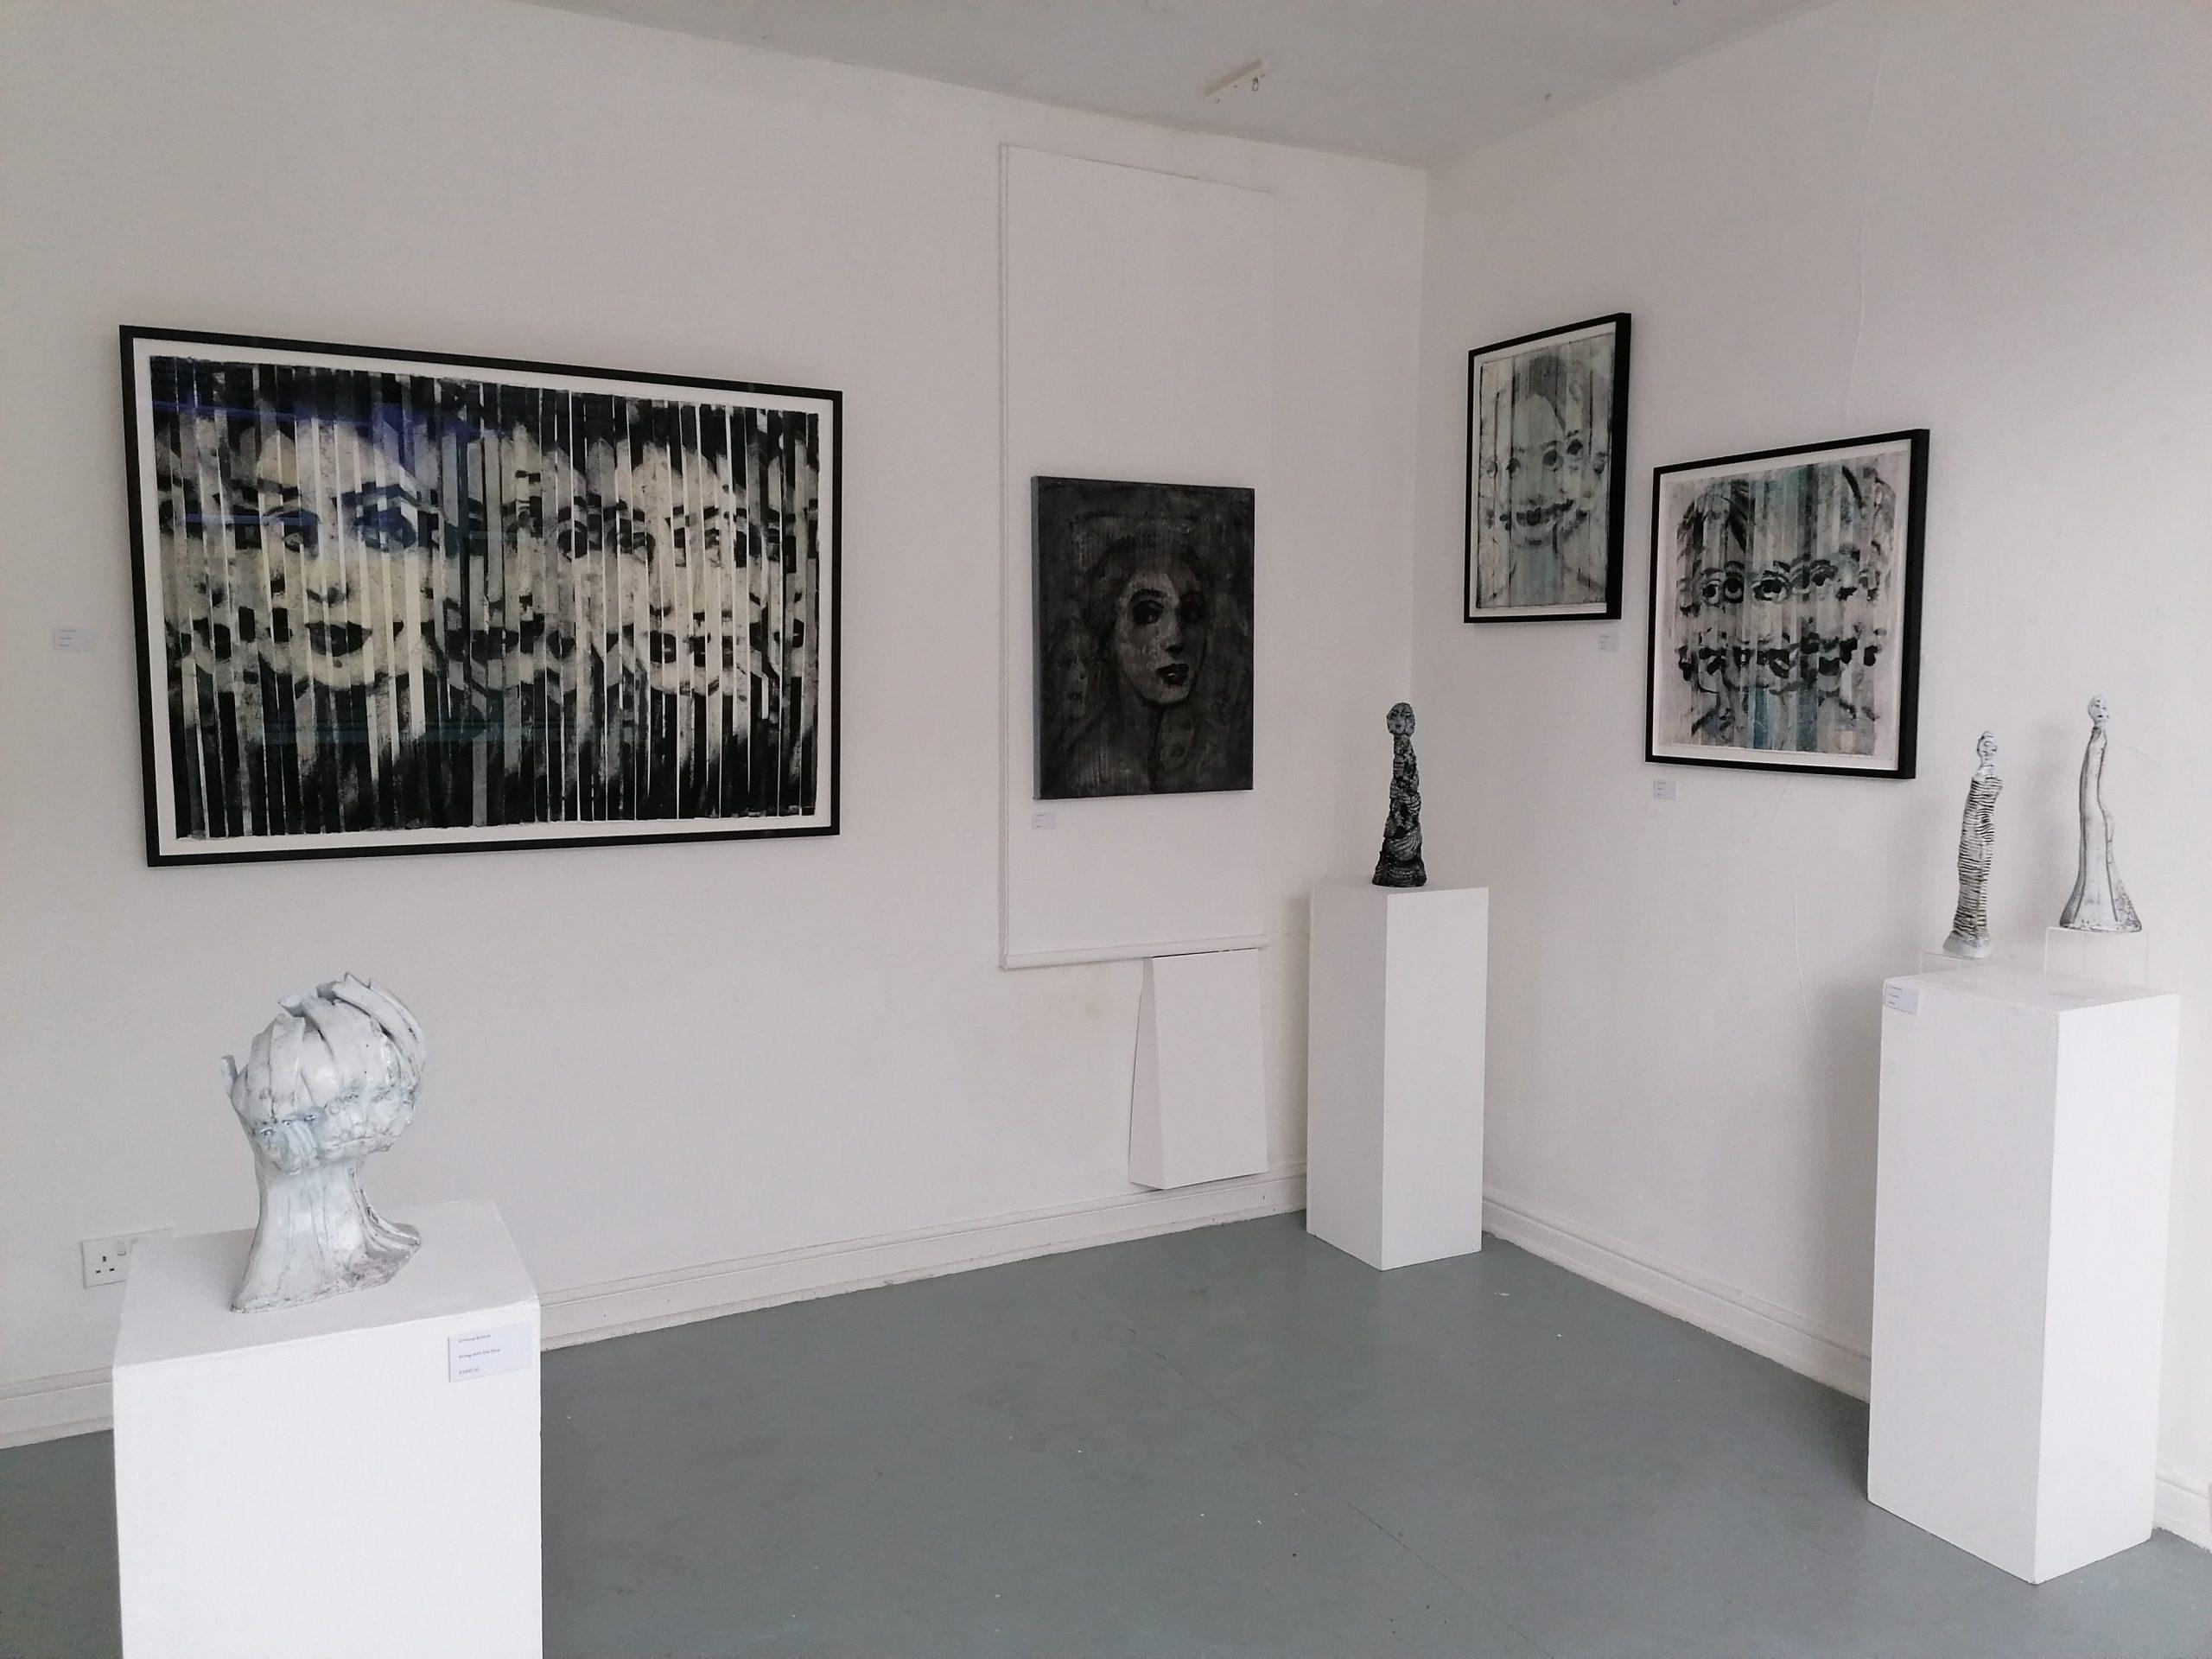 Exhibition Lockdown March 2020